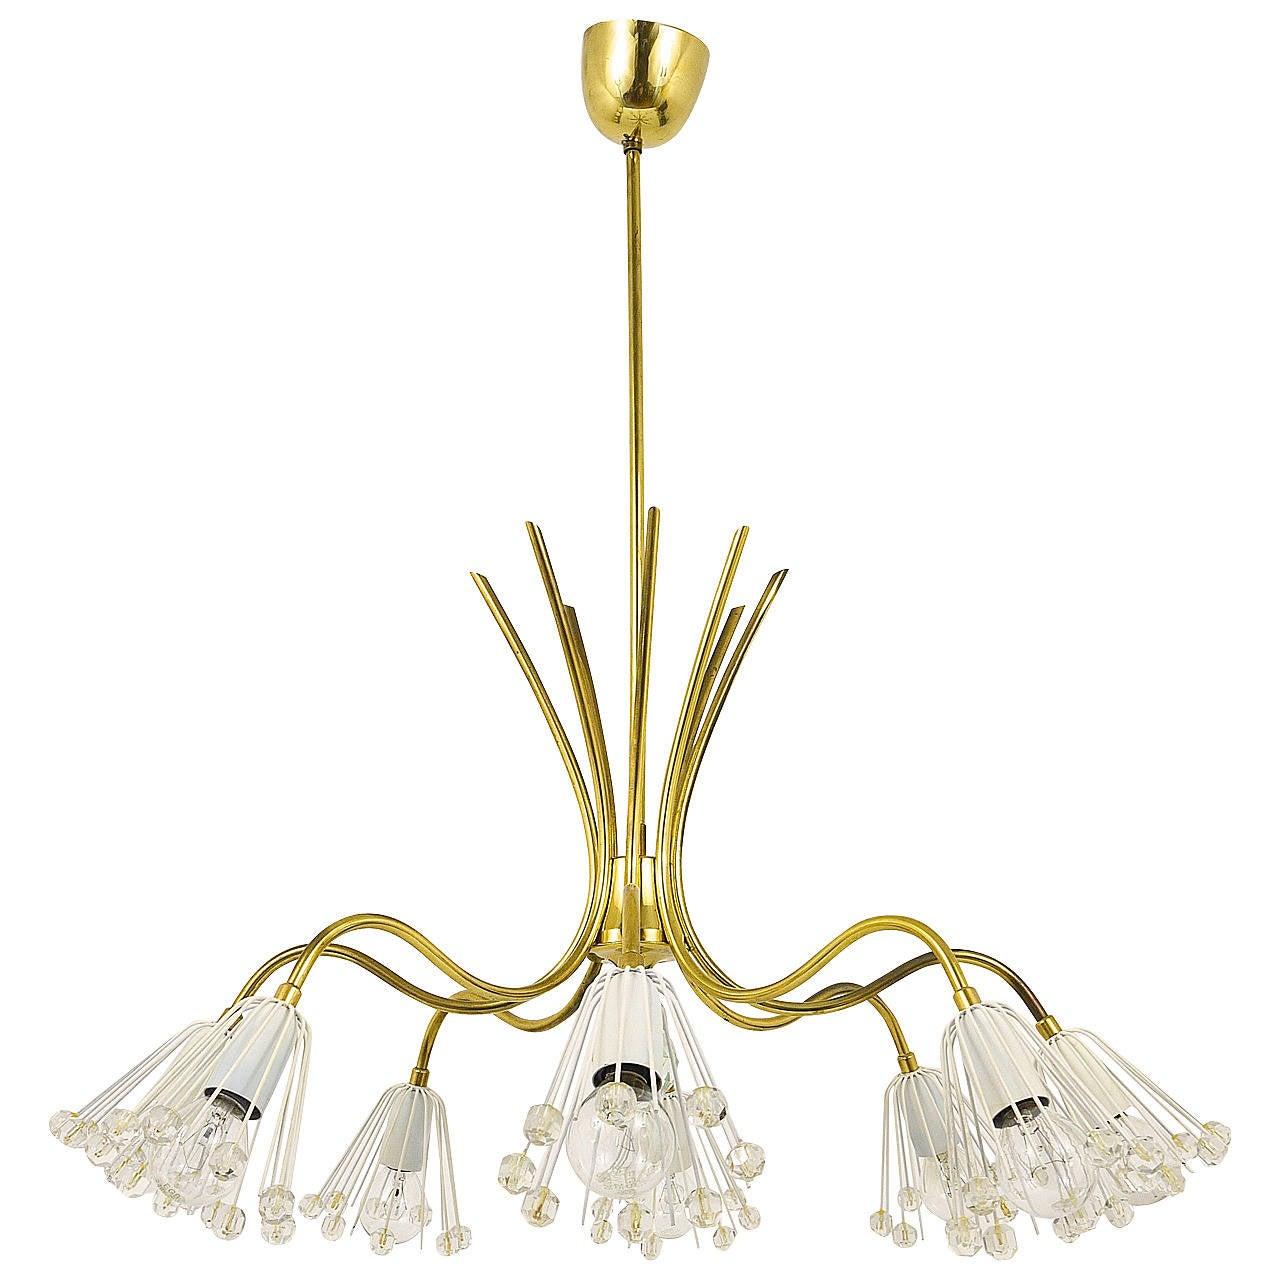 Floral Emil Stejnar Modernist Brass Chandelier, Rupert Nikoll, Austria, 1950s